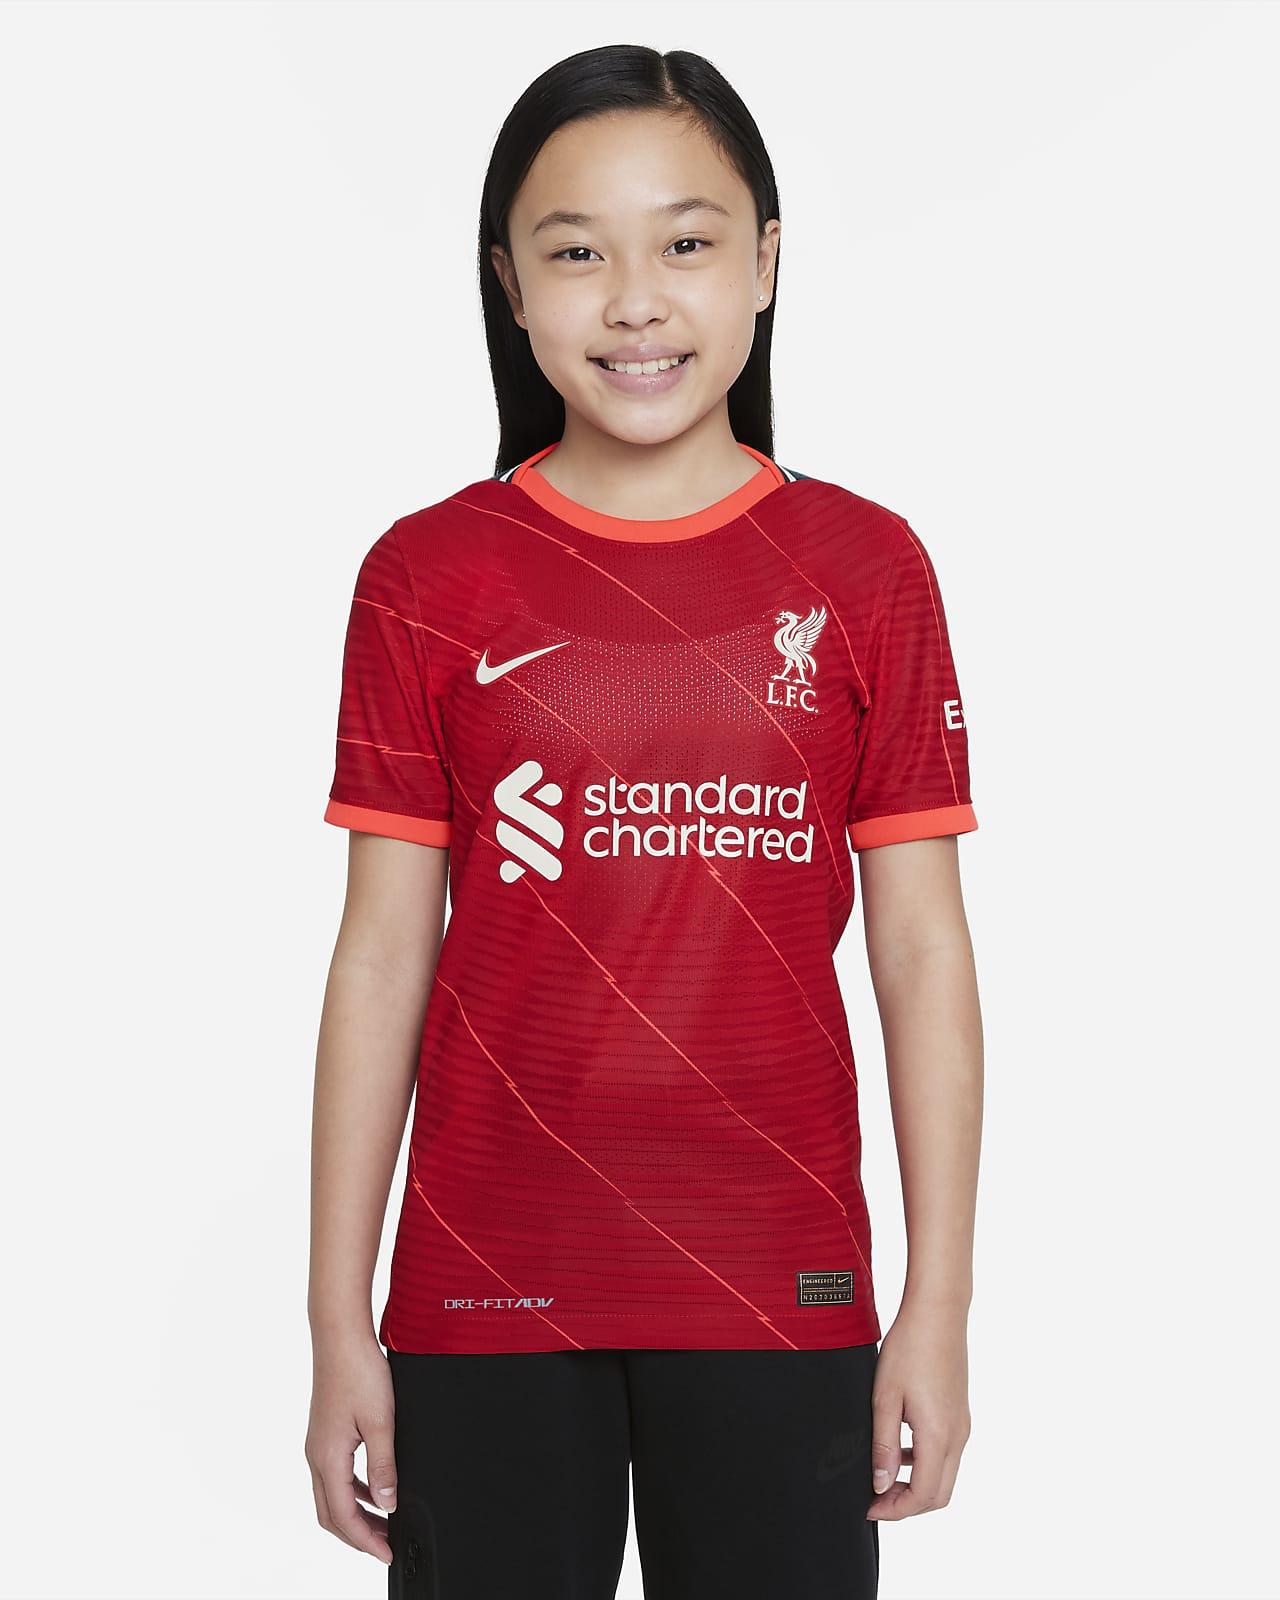 Liverpool F.C. 2021/22 Match Home Older Kids' Nike Dri-FIT ADV Football Shirt